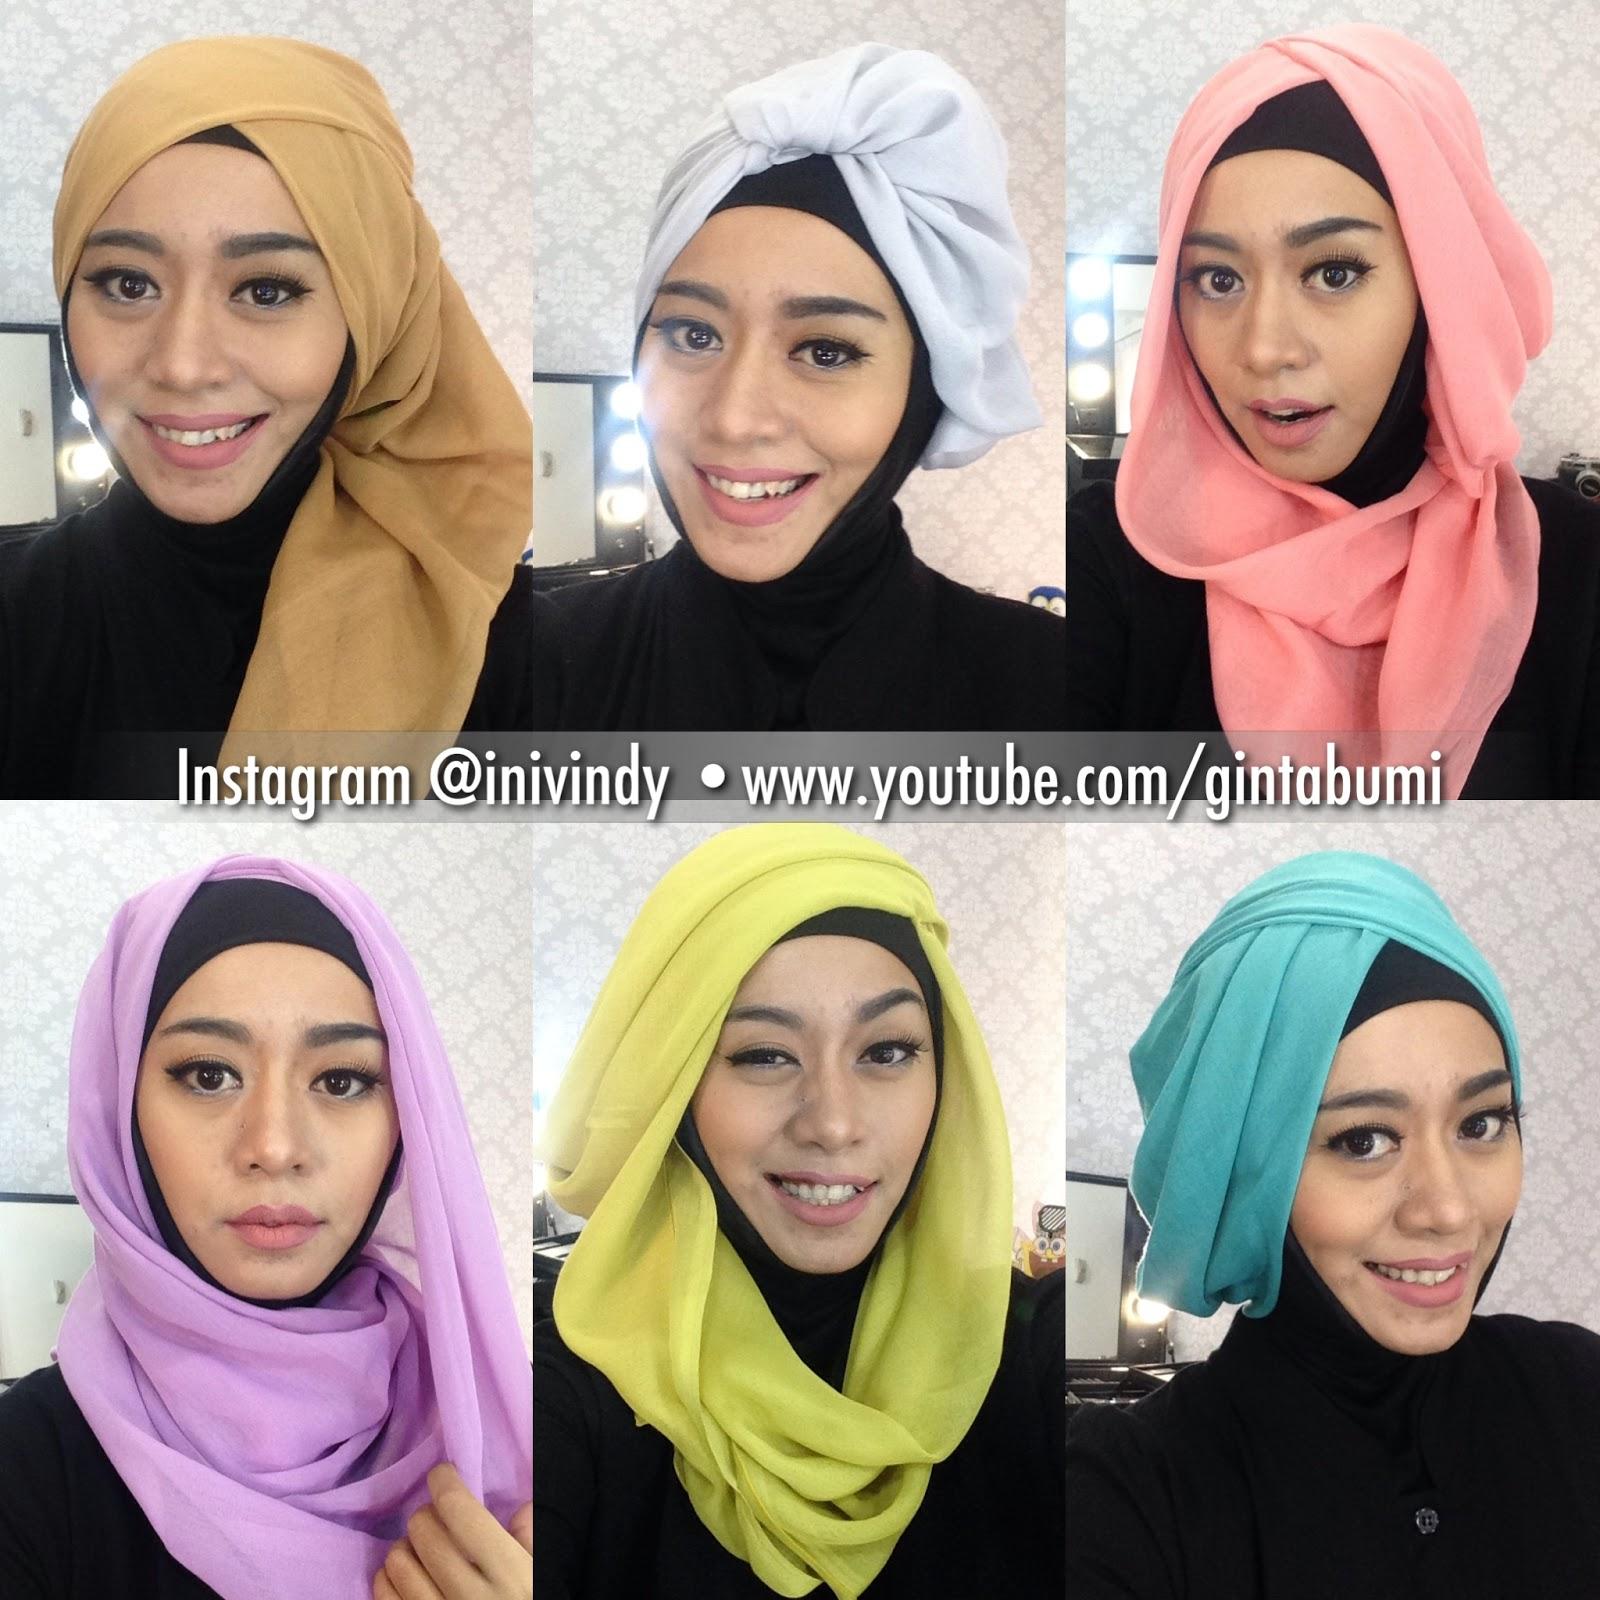 Ini Vindy Yang Ajaib Merasa Gaya Hijab Segi Empat Itu Itu Aja